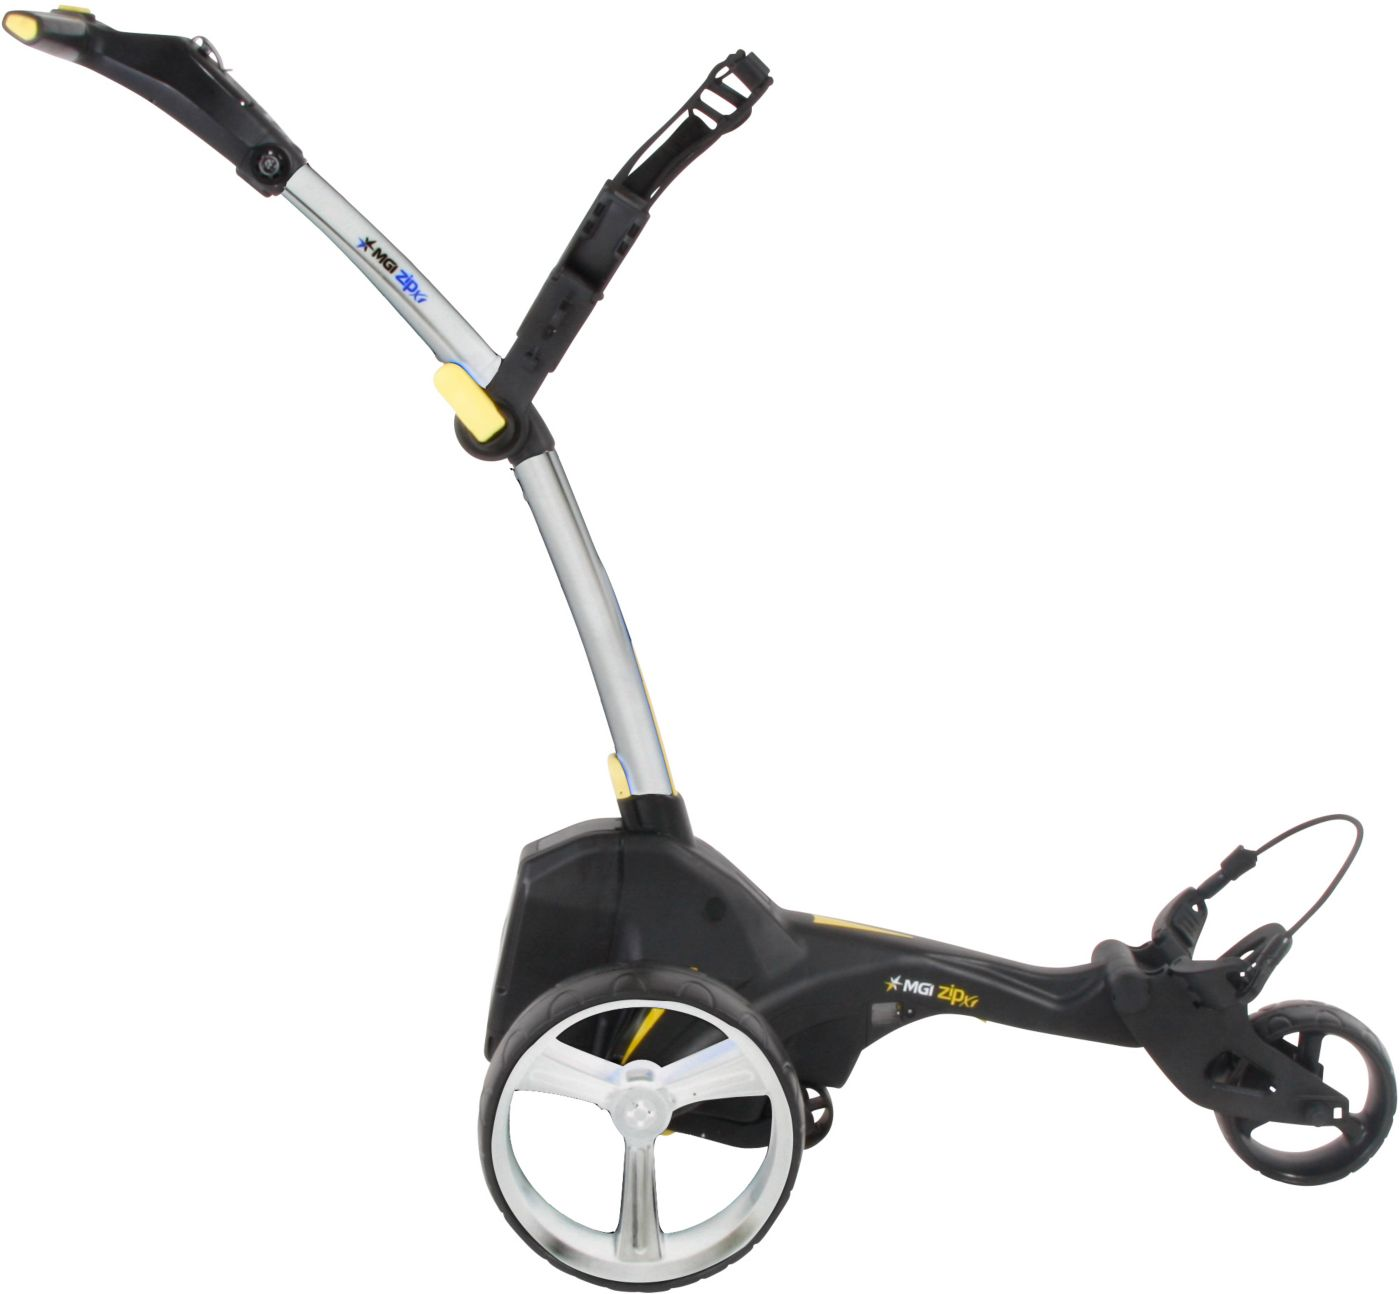 MGI Zip X1 Lithium Electric Golf Caddie